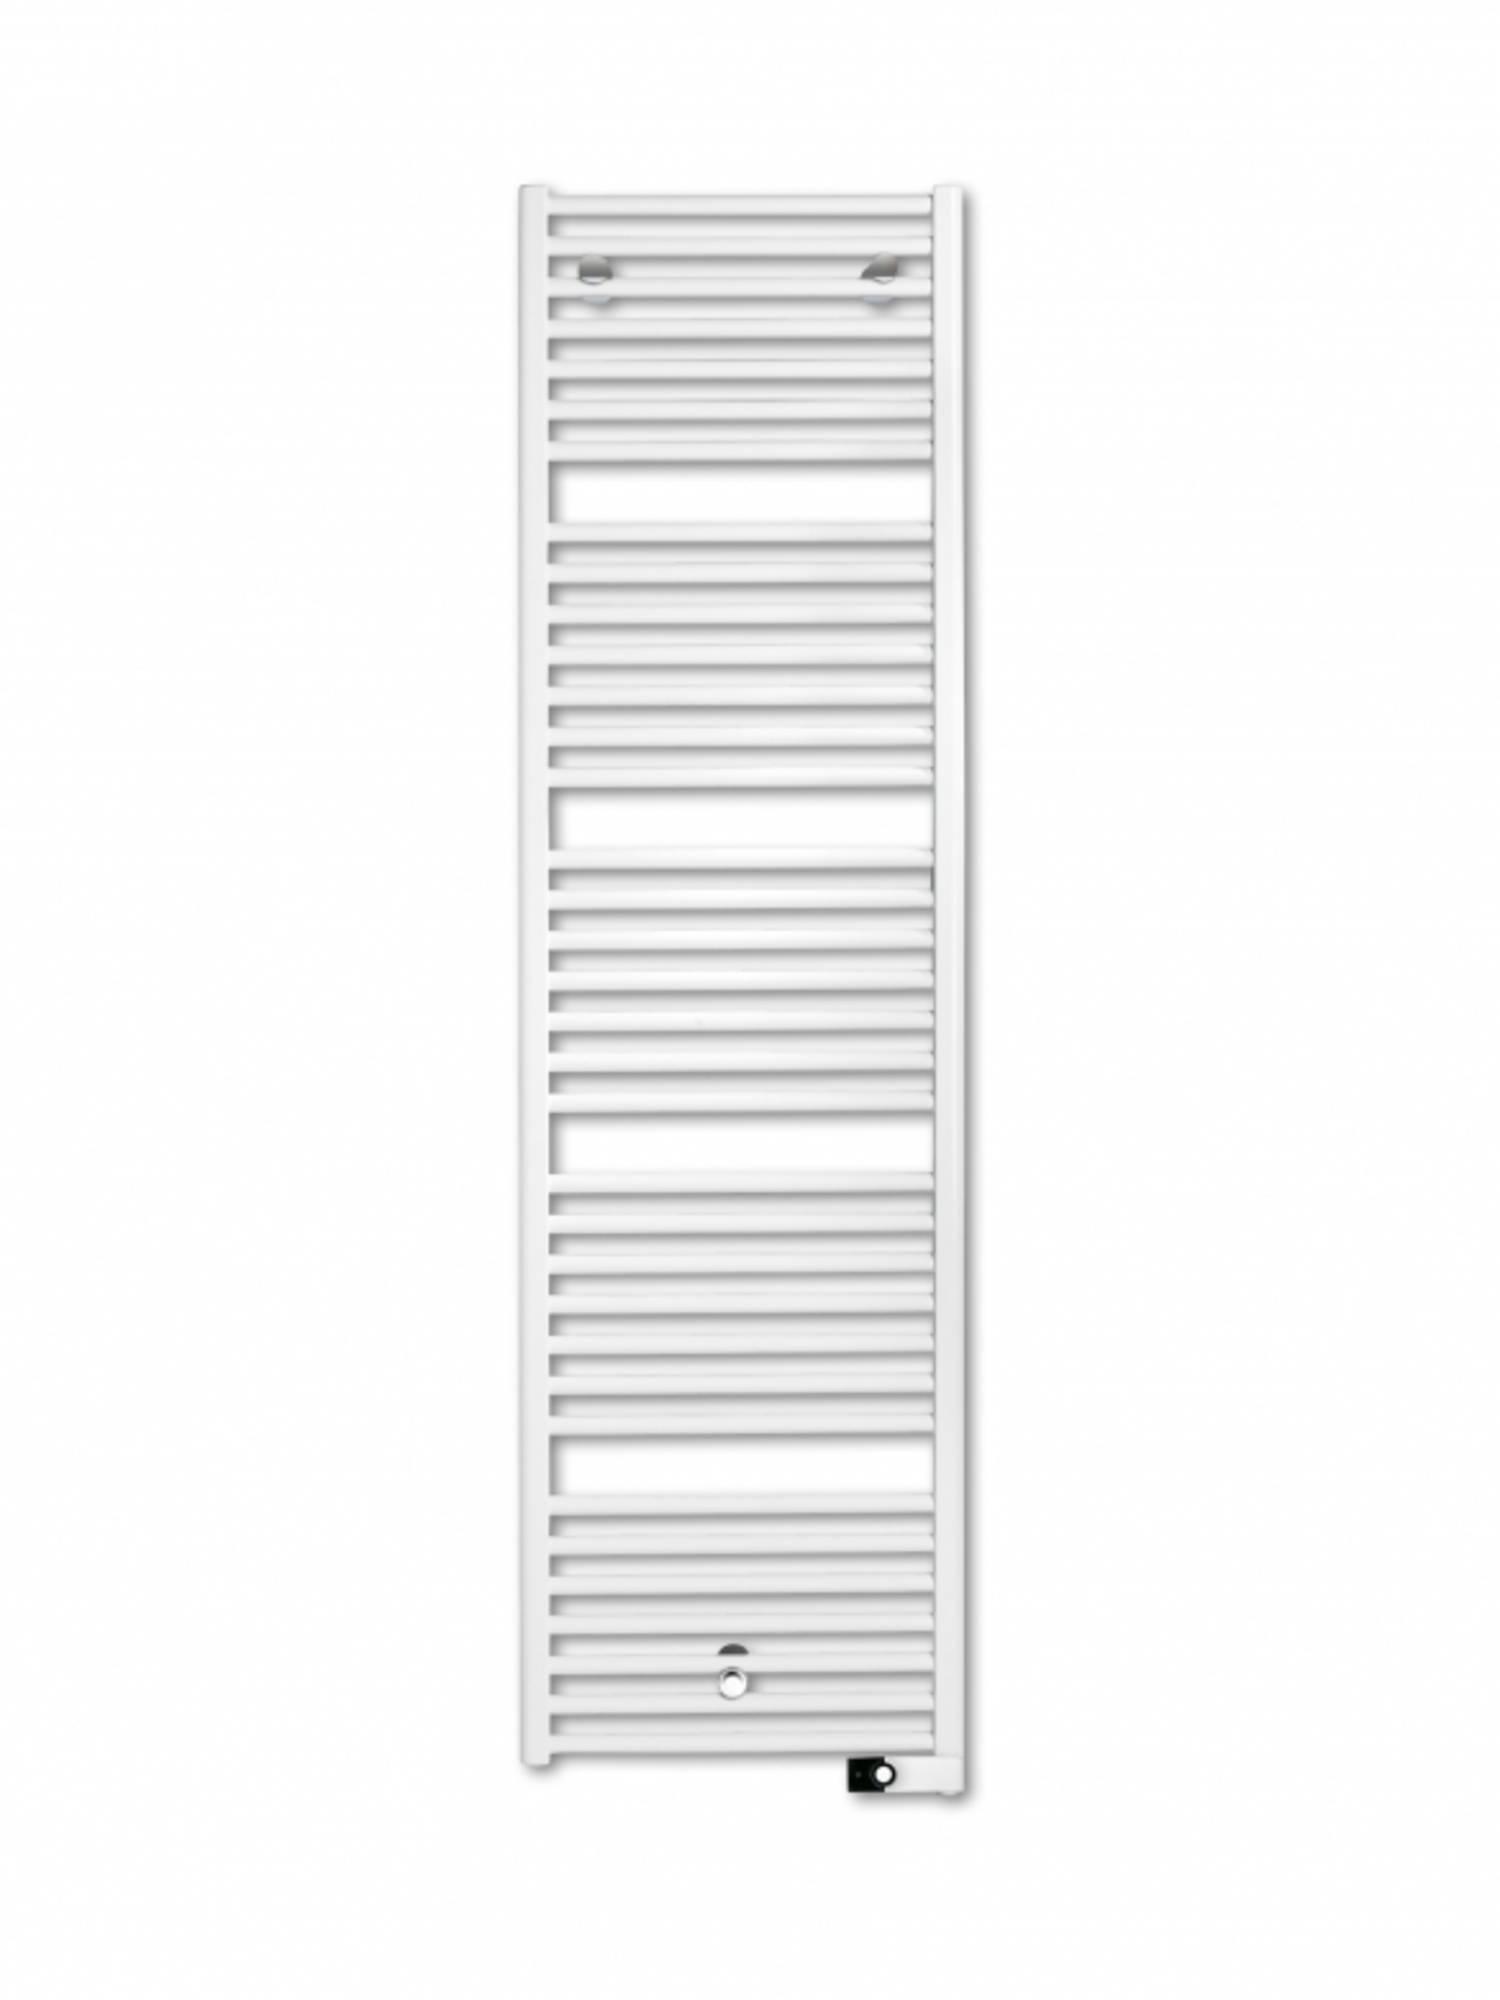 Vasco Iris HD-EL elektrische radiator 188x60cm 1250W Antraciet January